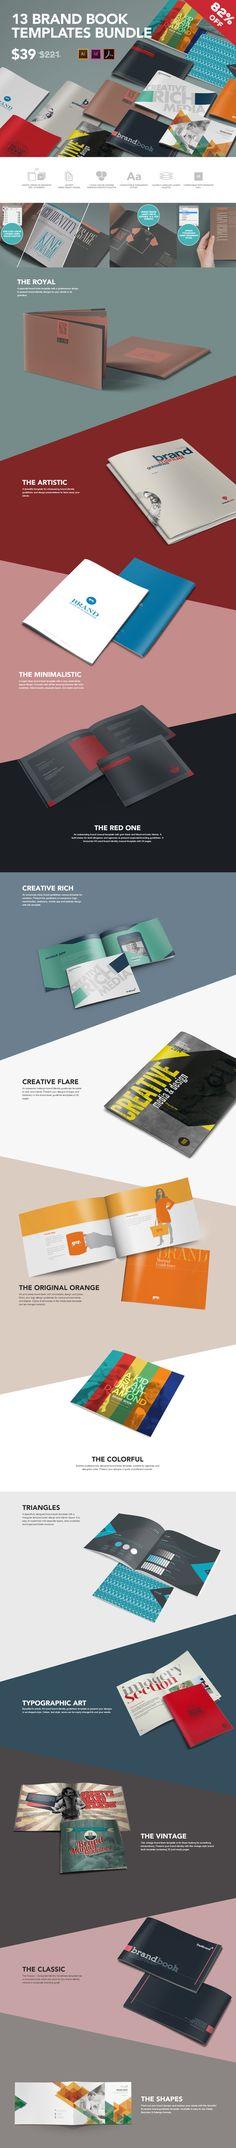 13 Brand Guidelines Templates Bundle by ZippyPixels on Creative Market